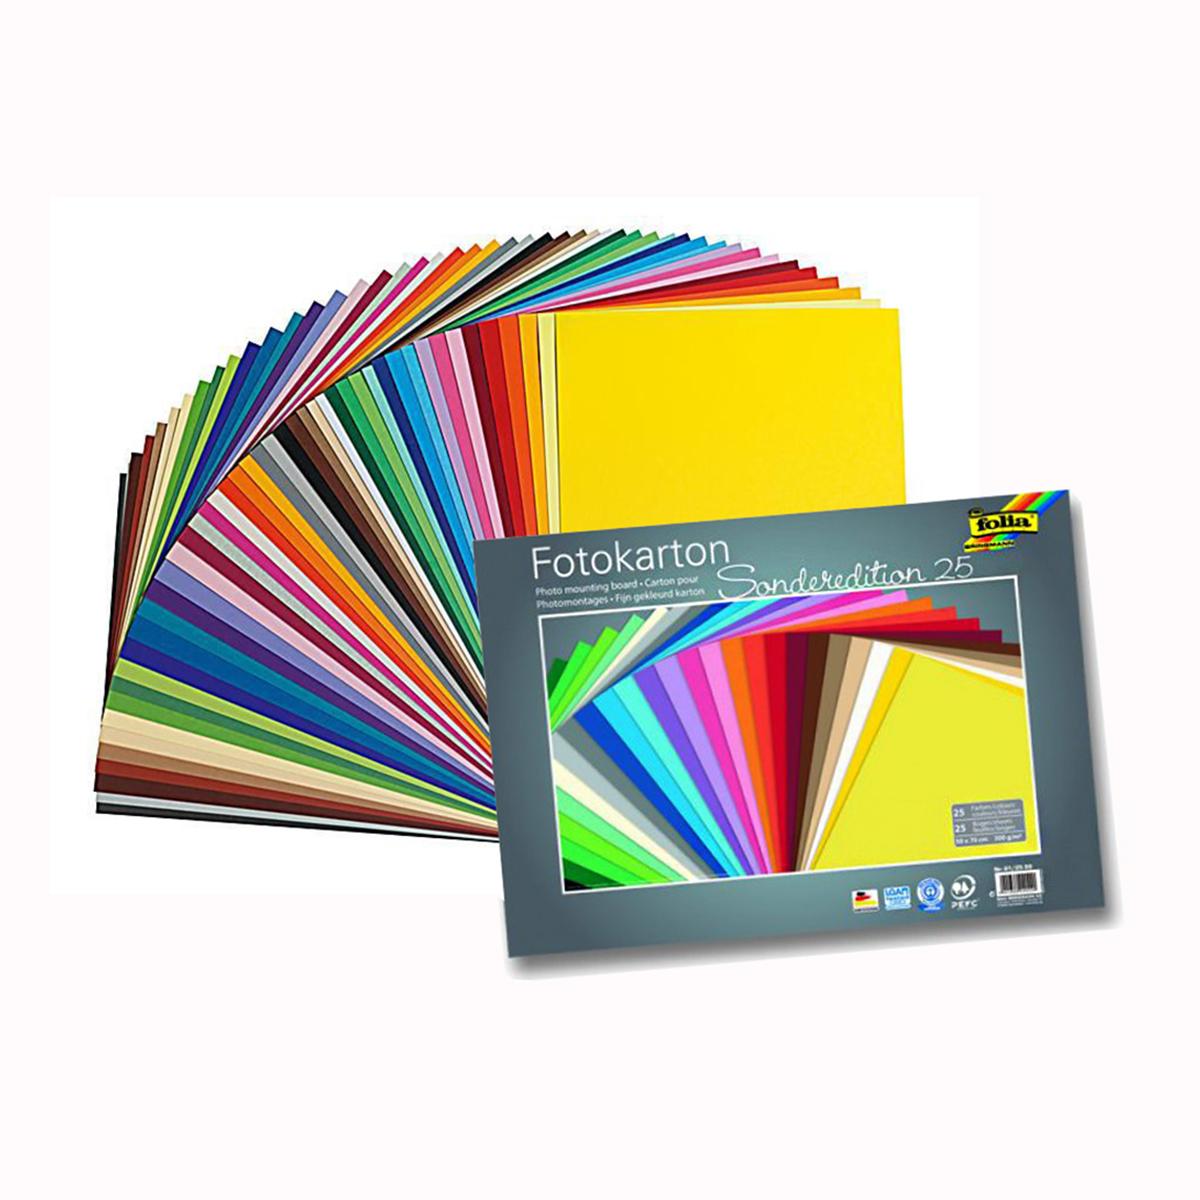 Набор картона Folia, цвет: мультиколор, 25 х 35 см, 25 листов. 77143597714359